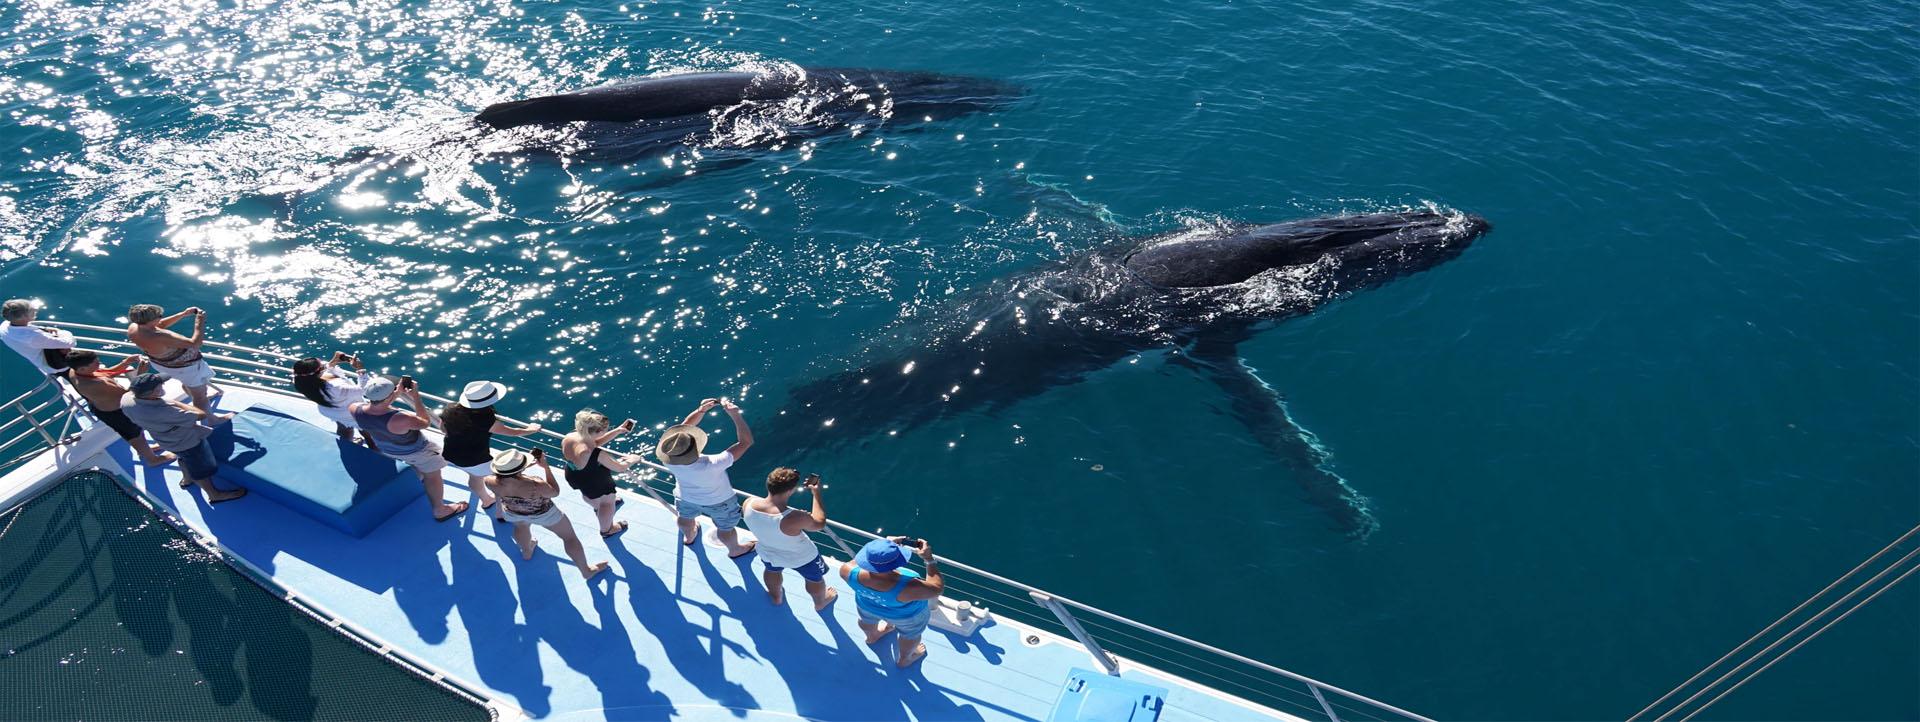 KARMA IV whale watching Broome